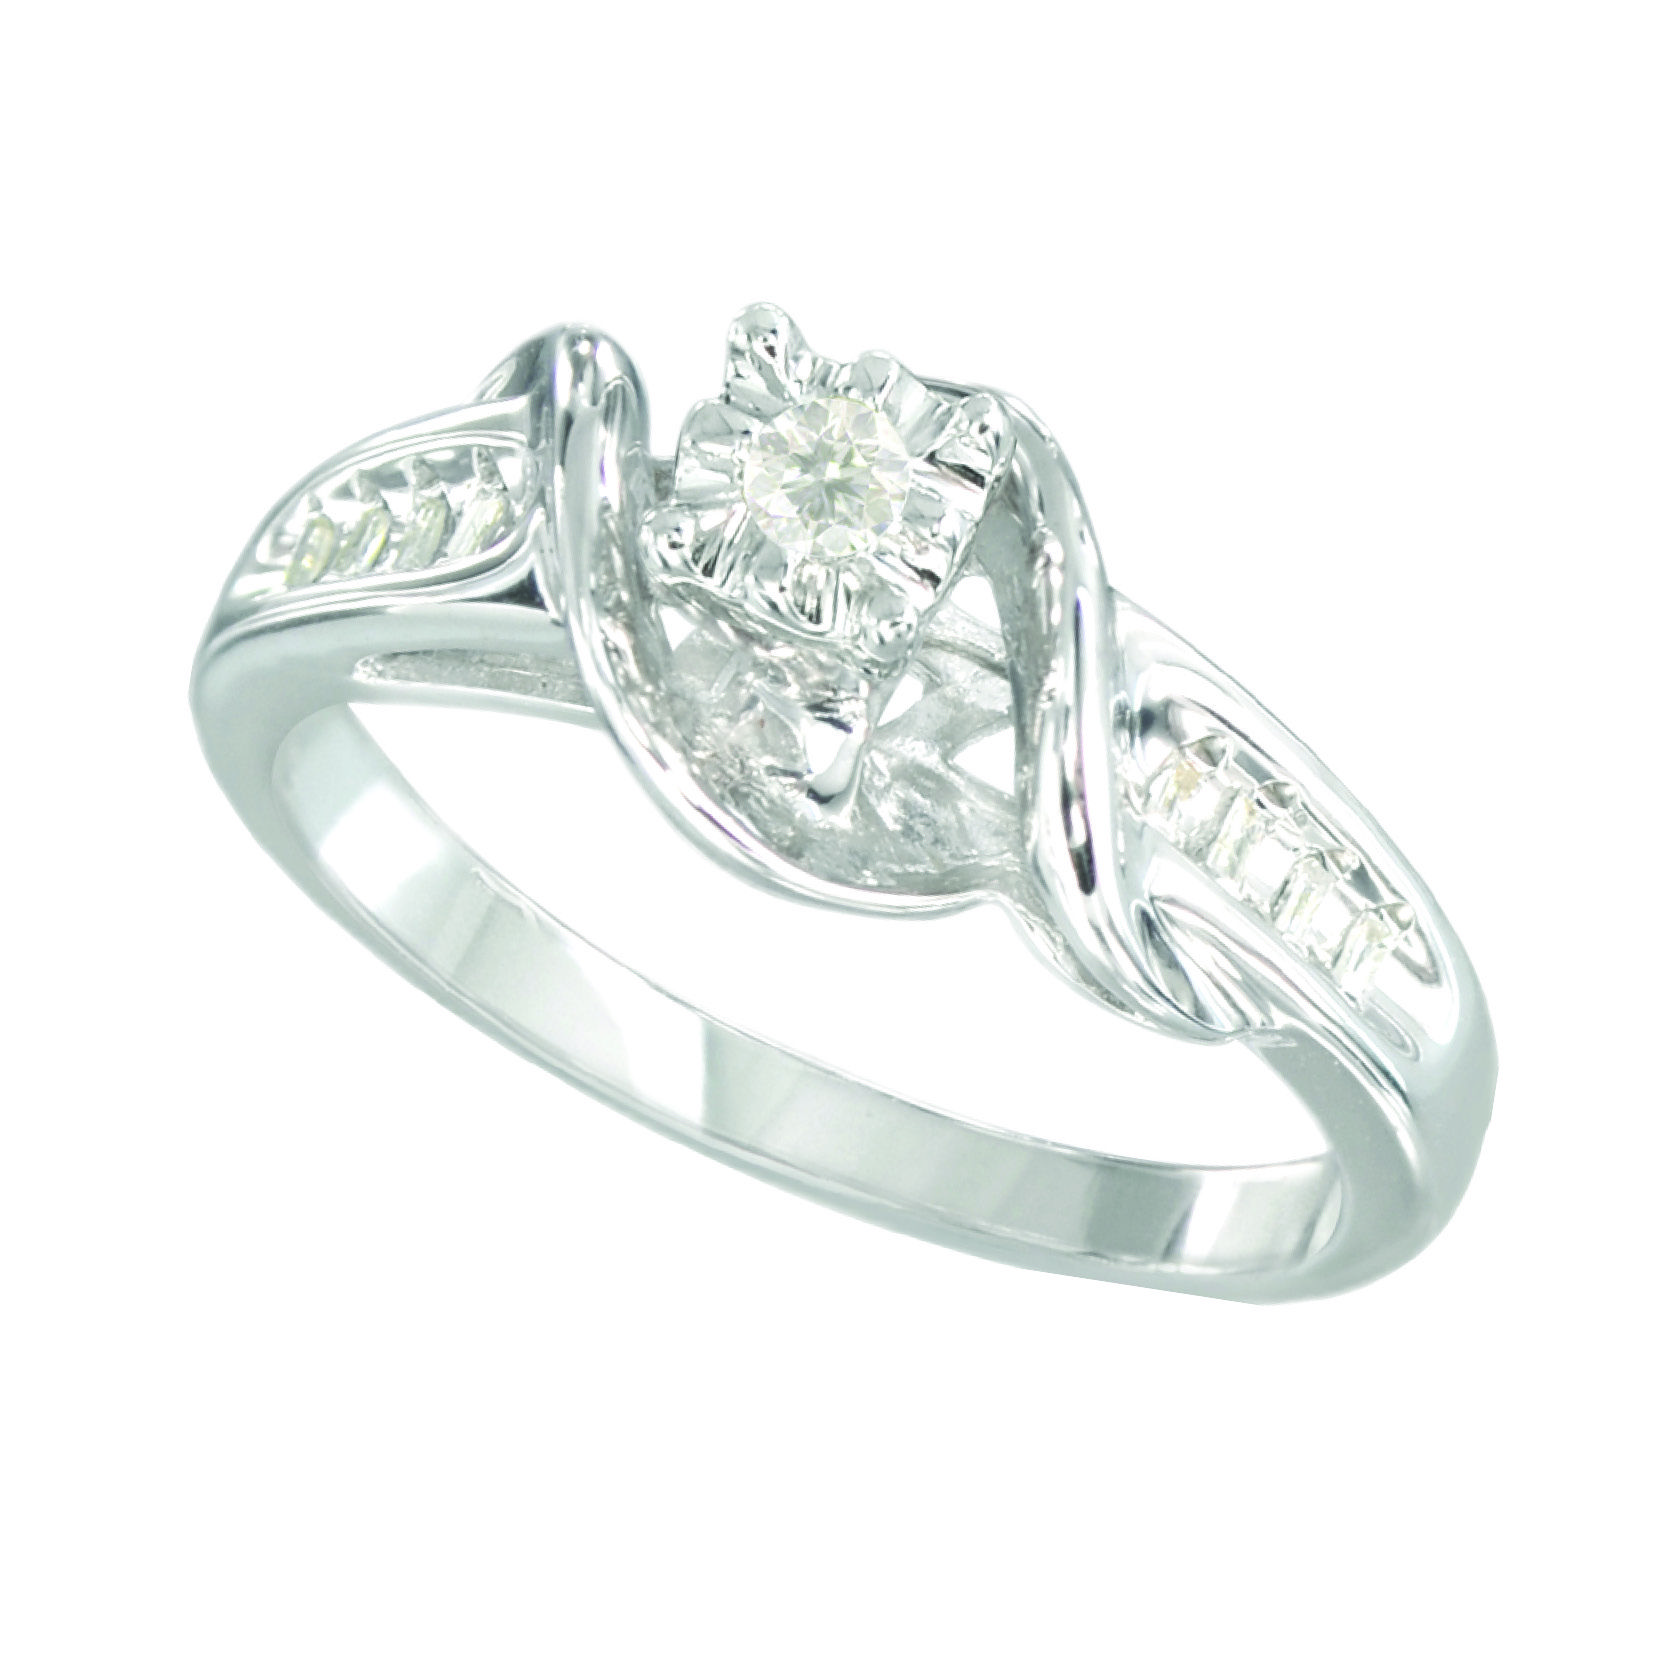 walmart jewelry engagement rings Walmart Wedding Rings On Sale